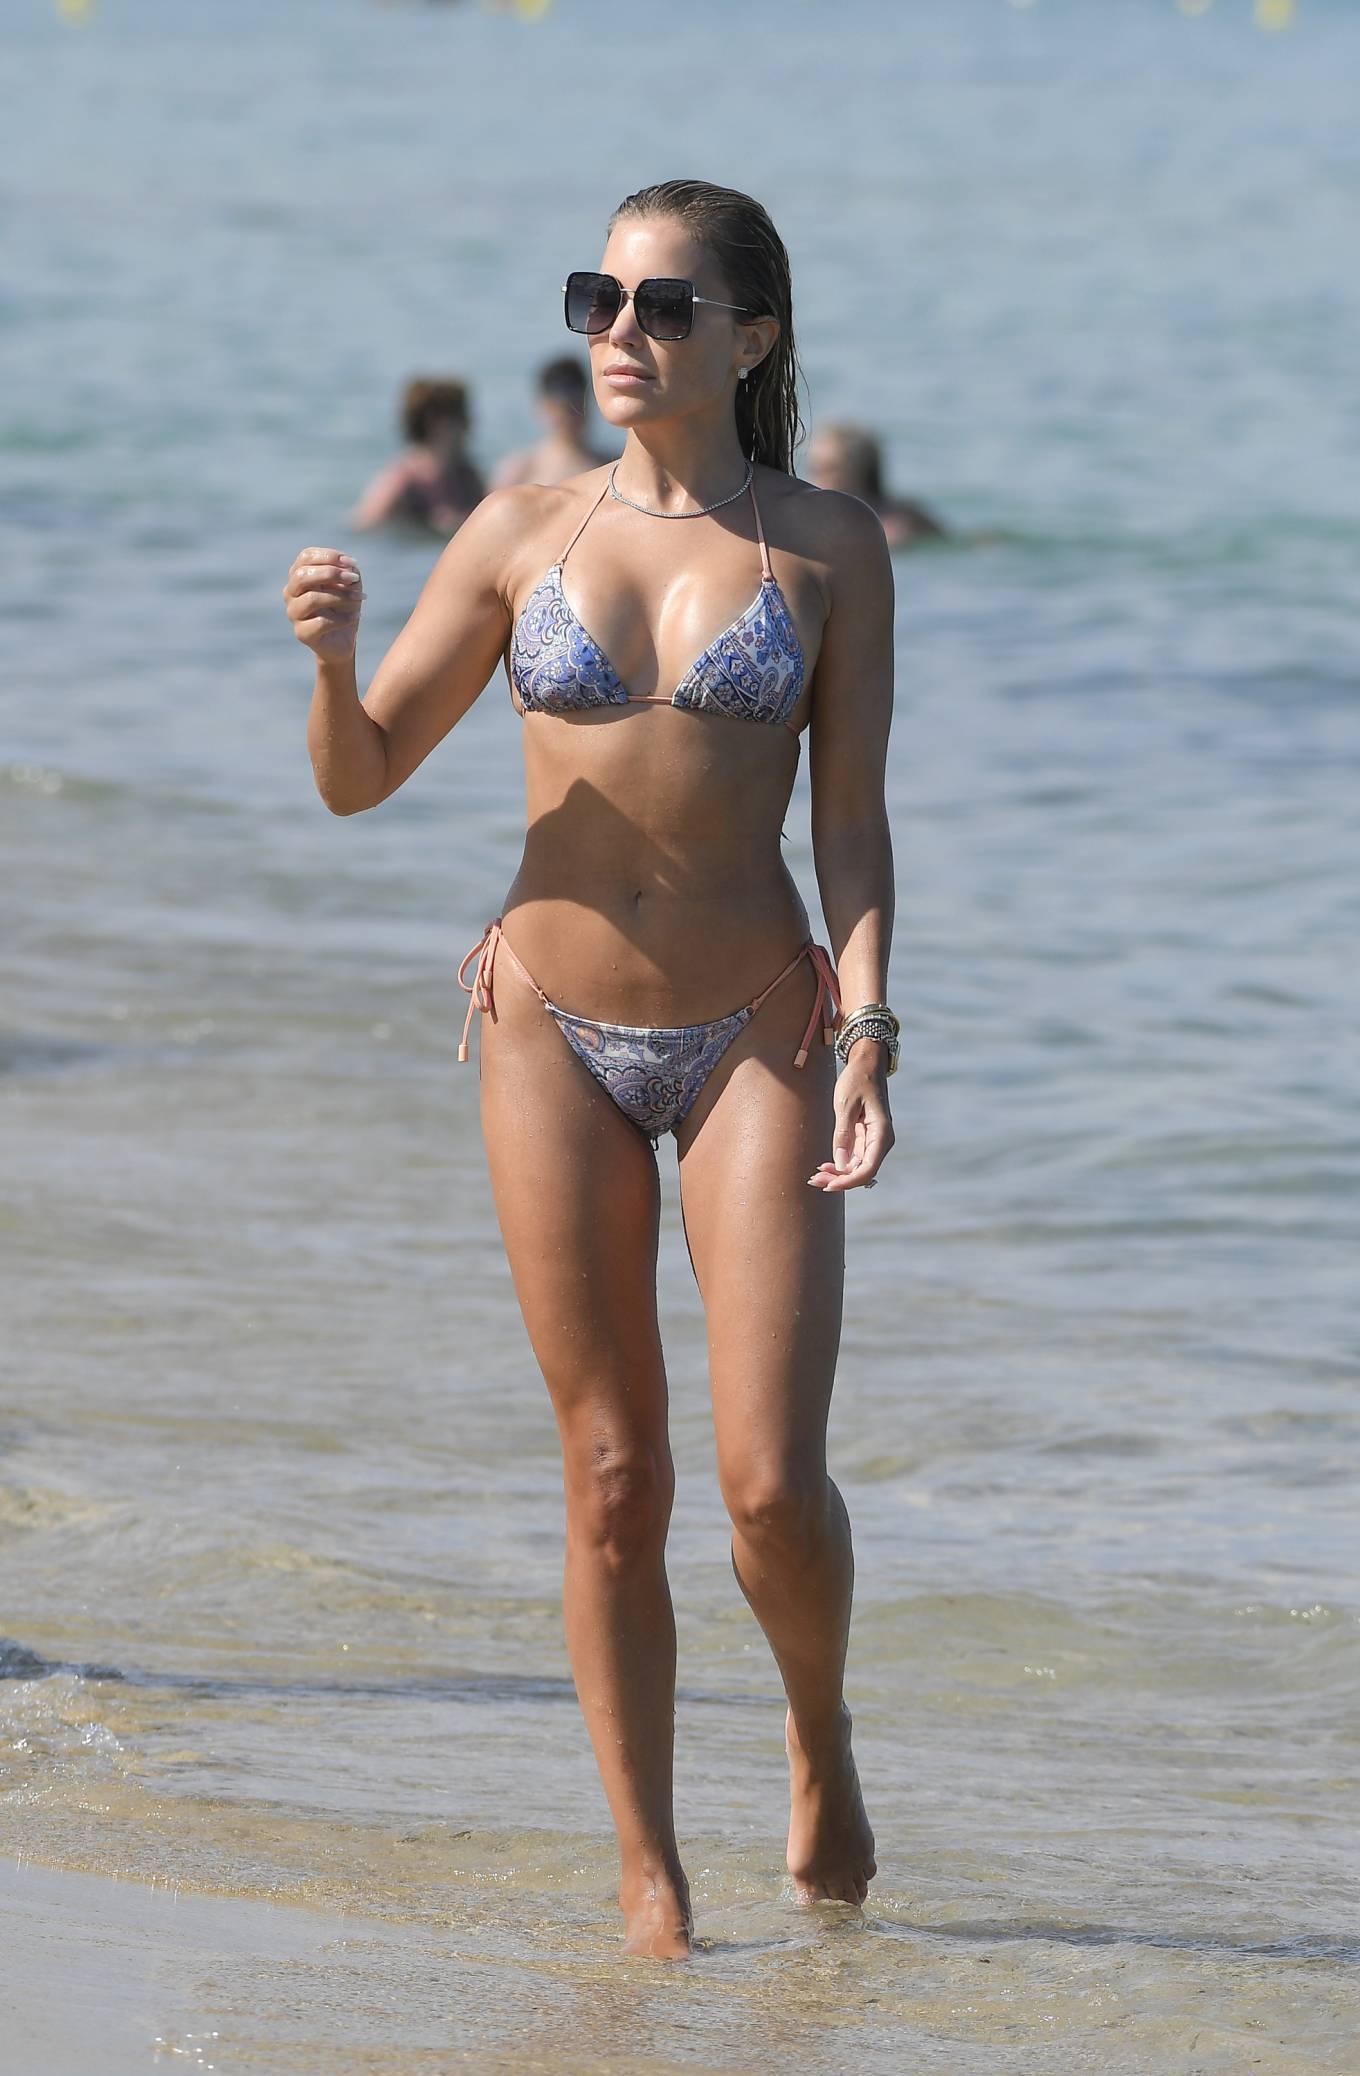 Sylvie Meis 2021 : Sylvie Meis – In a bikini with her husband Niclas Castello on the beach La Réserve in Ramatuelle-11